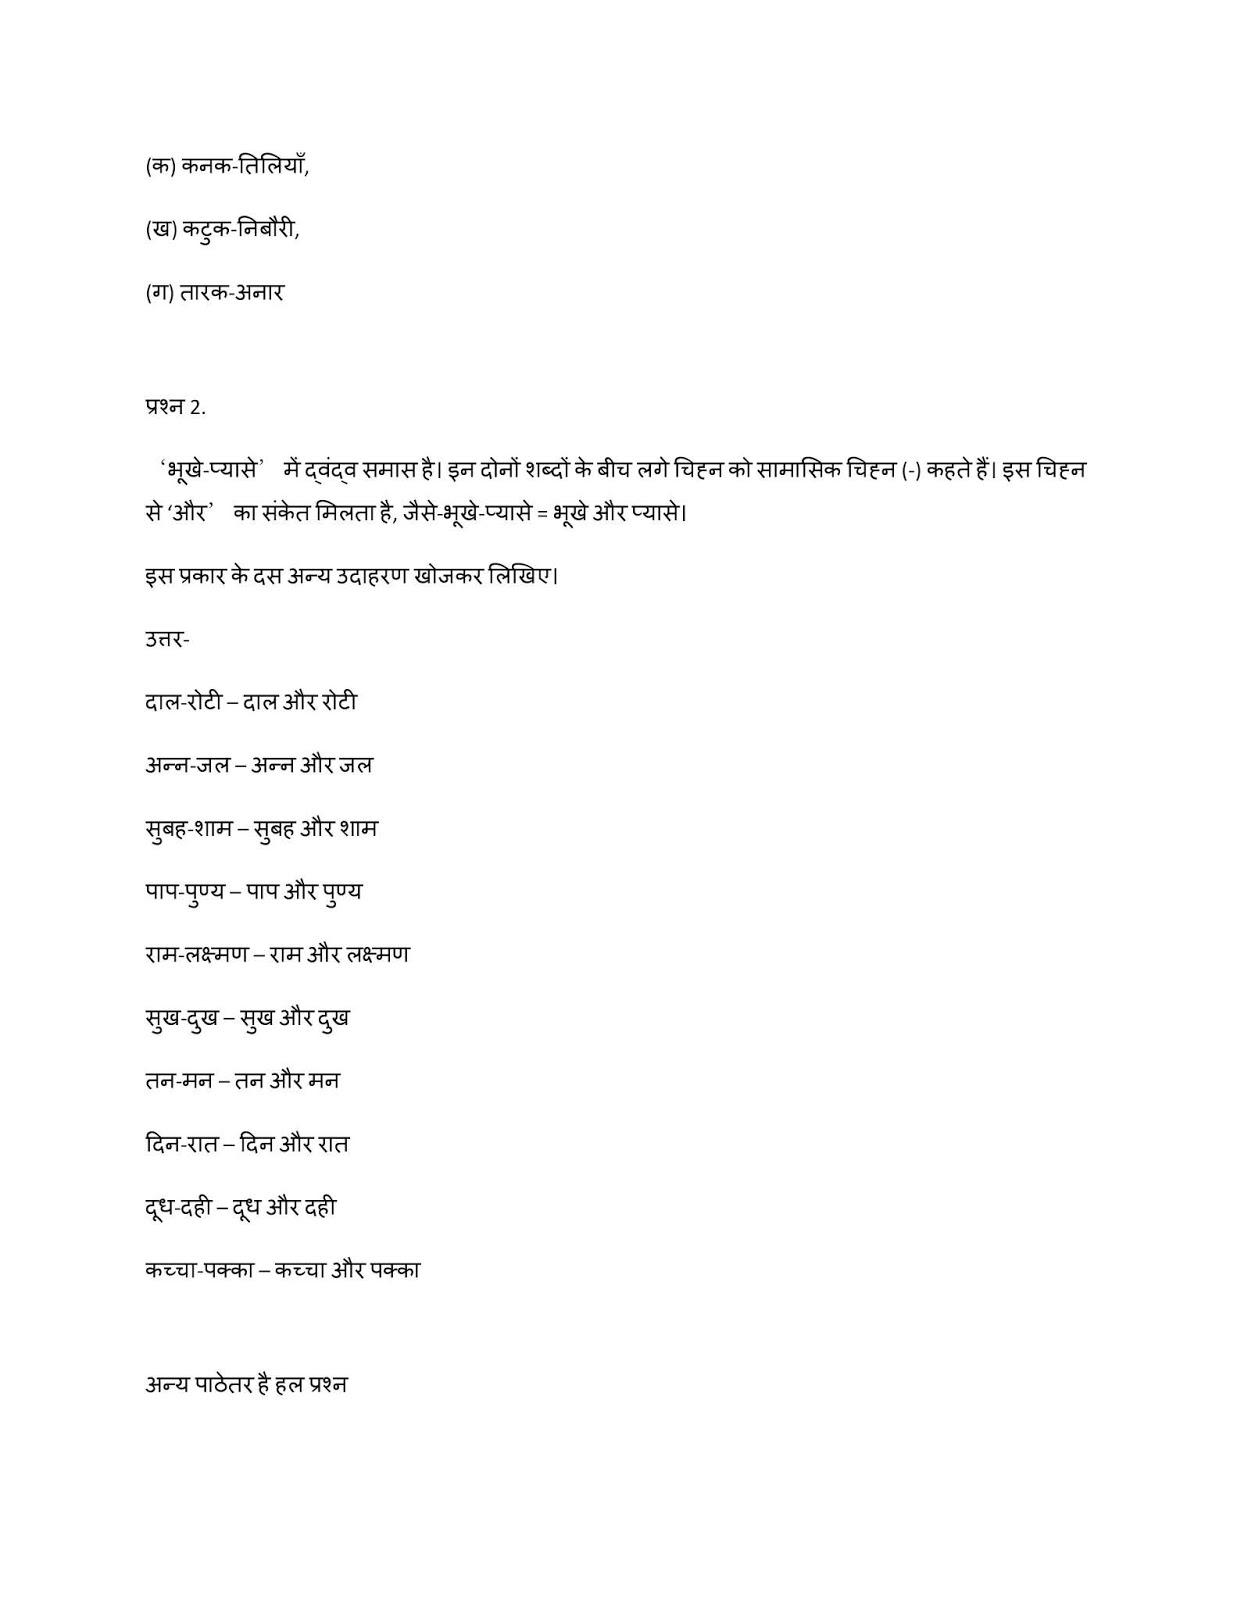 NCERT Solution For Class 7 Hindi Chapter 1 हम पंछी